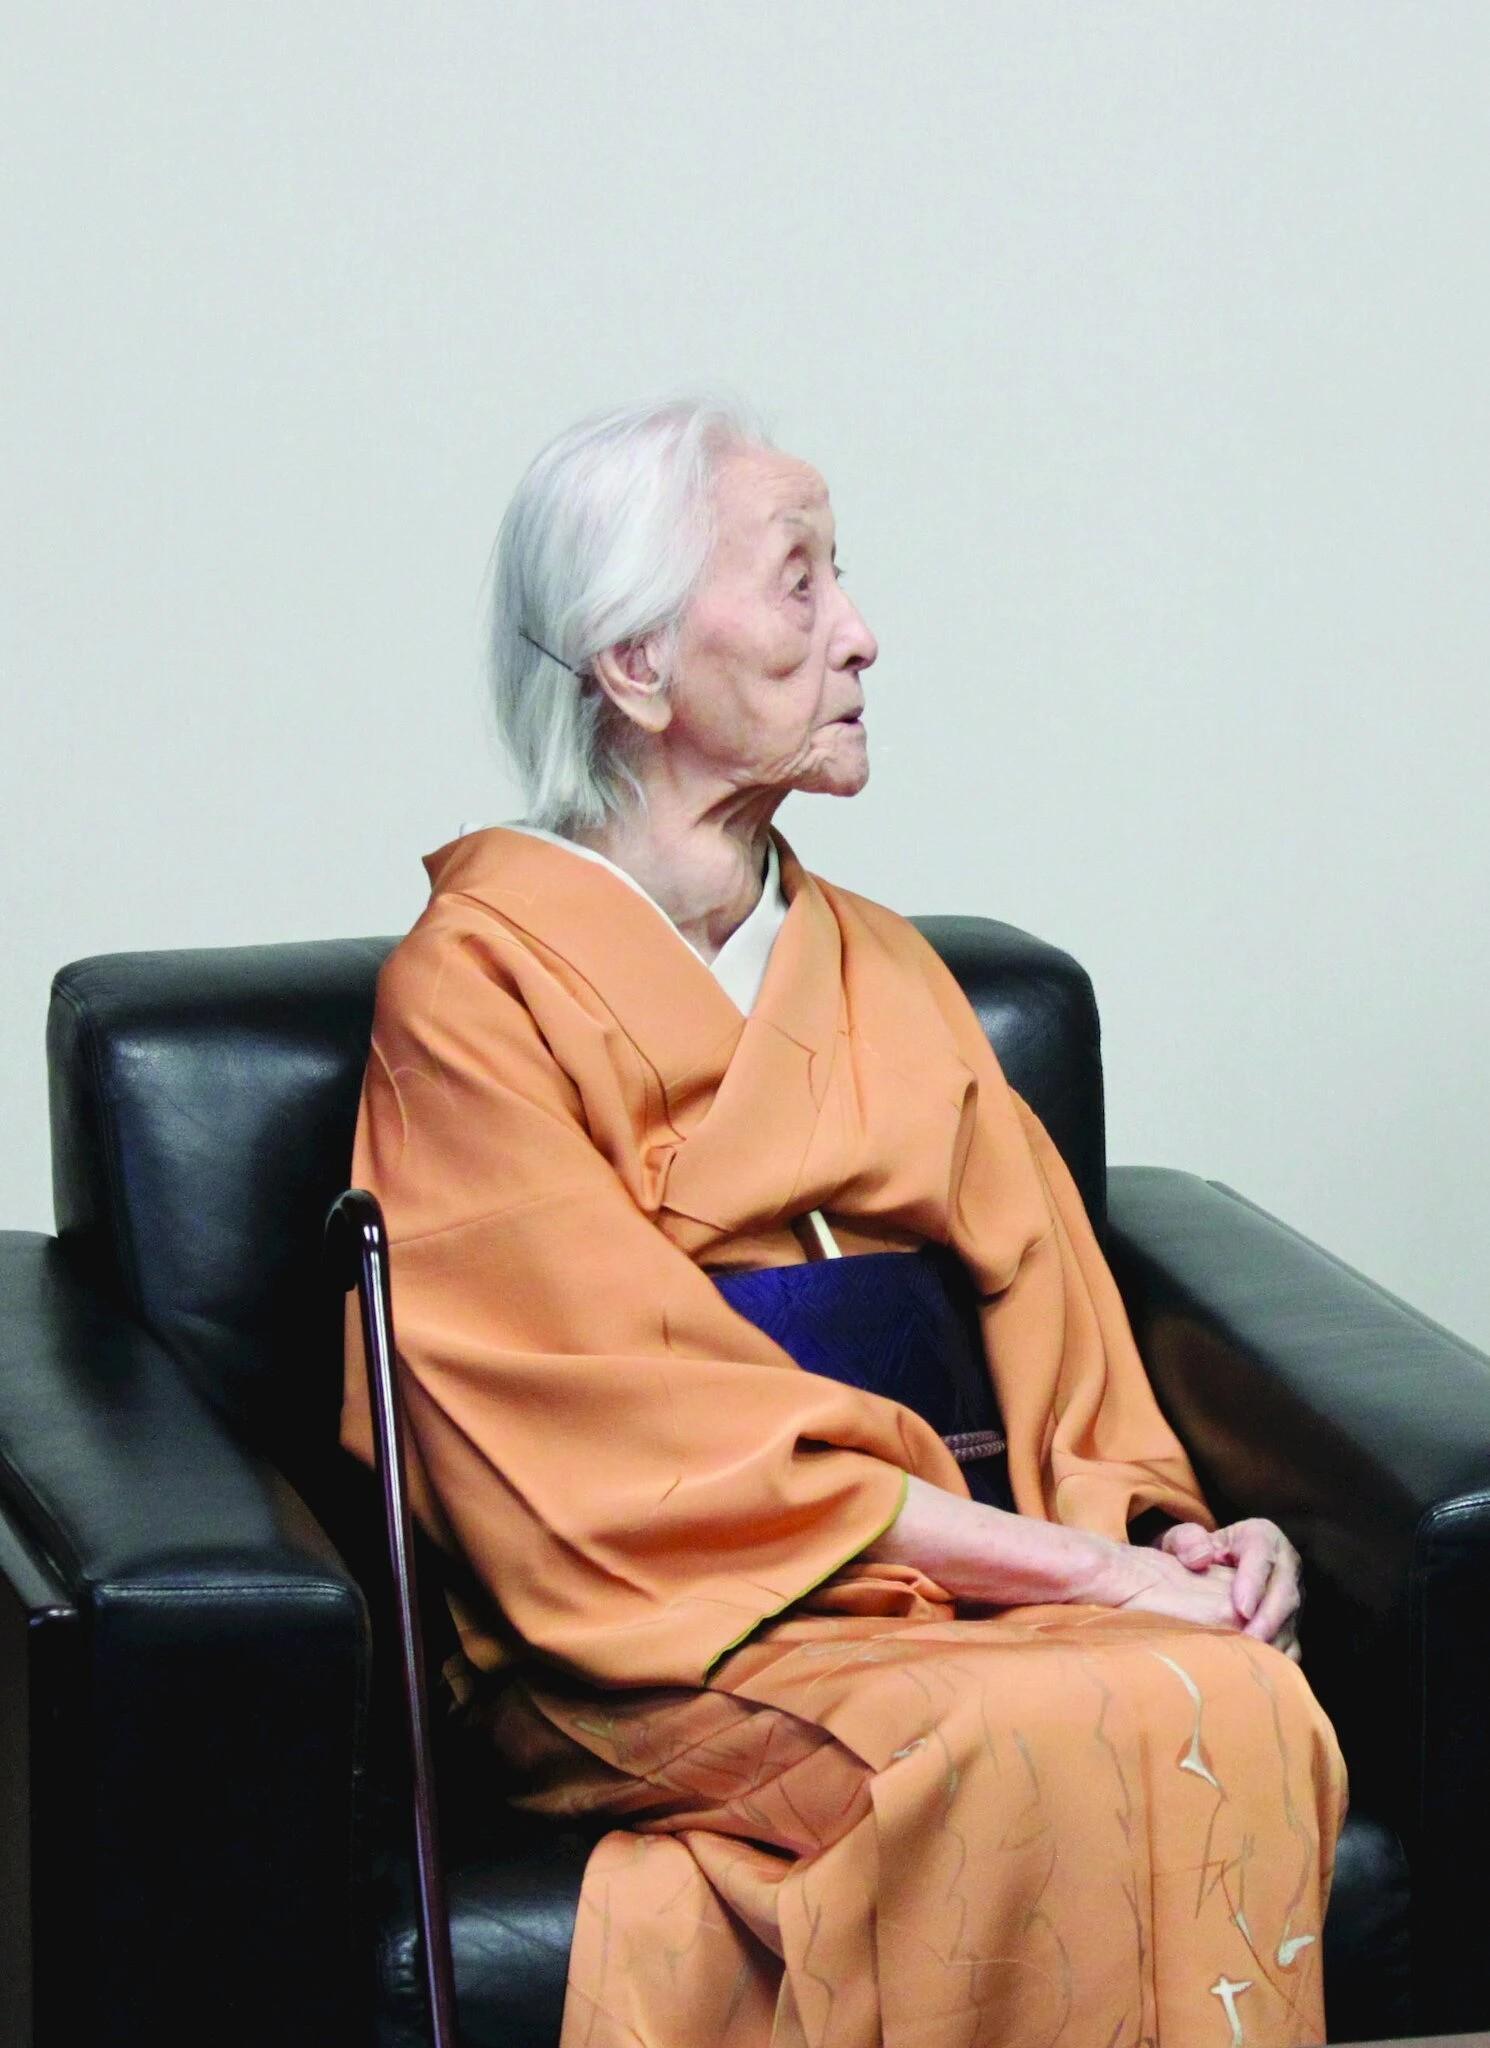 toko shinoda overleden